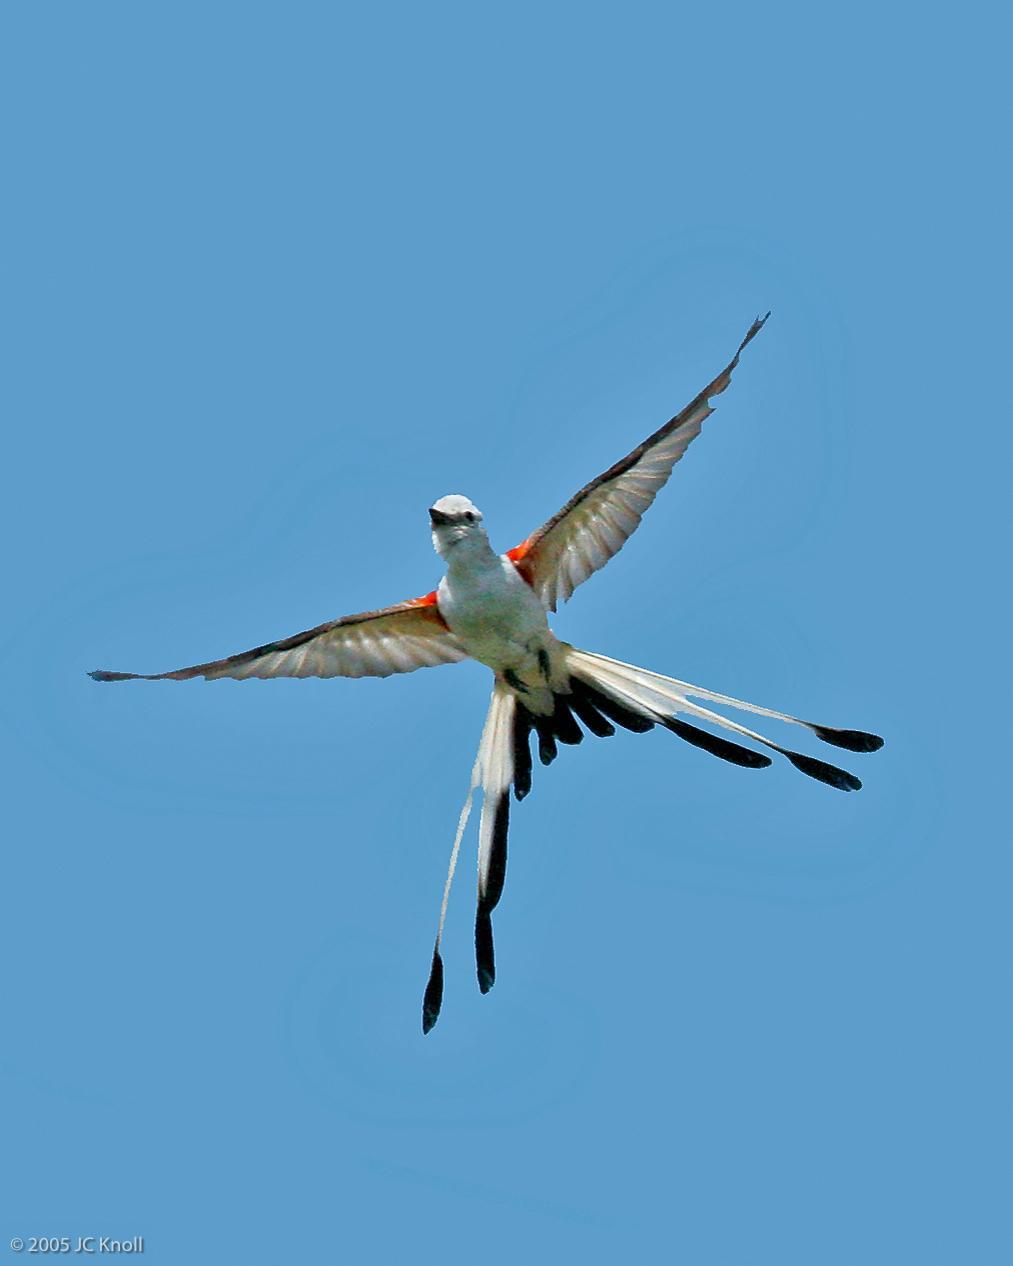 Scissor-tailed Flycatcher Photo by JC Knoll